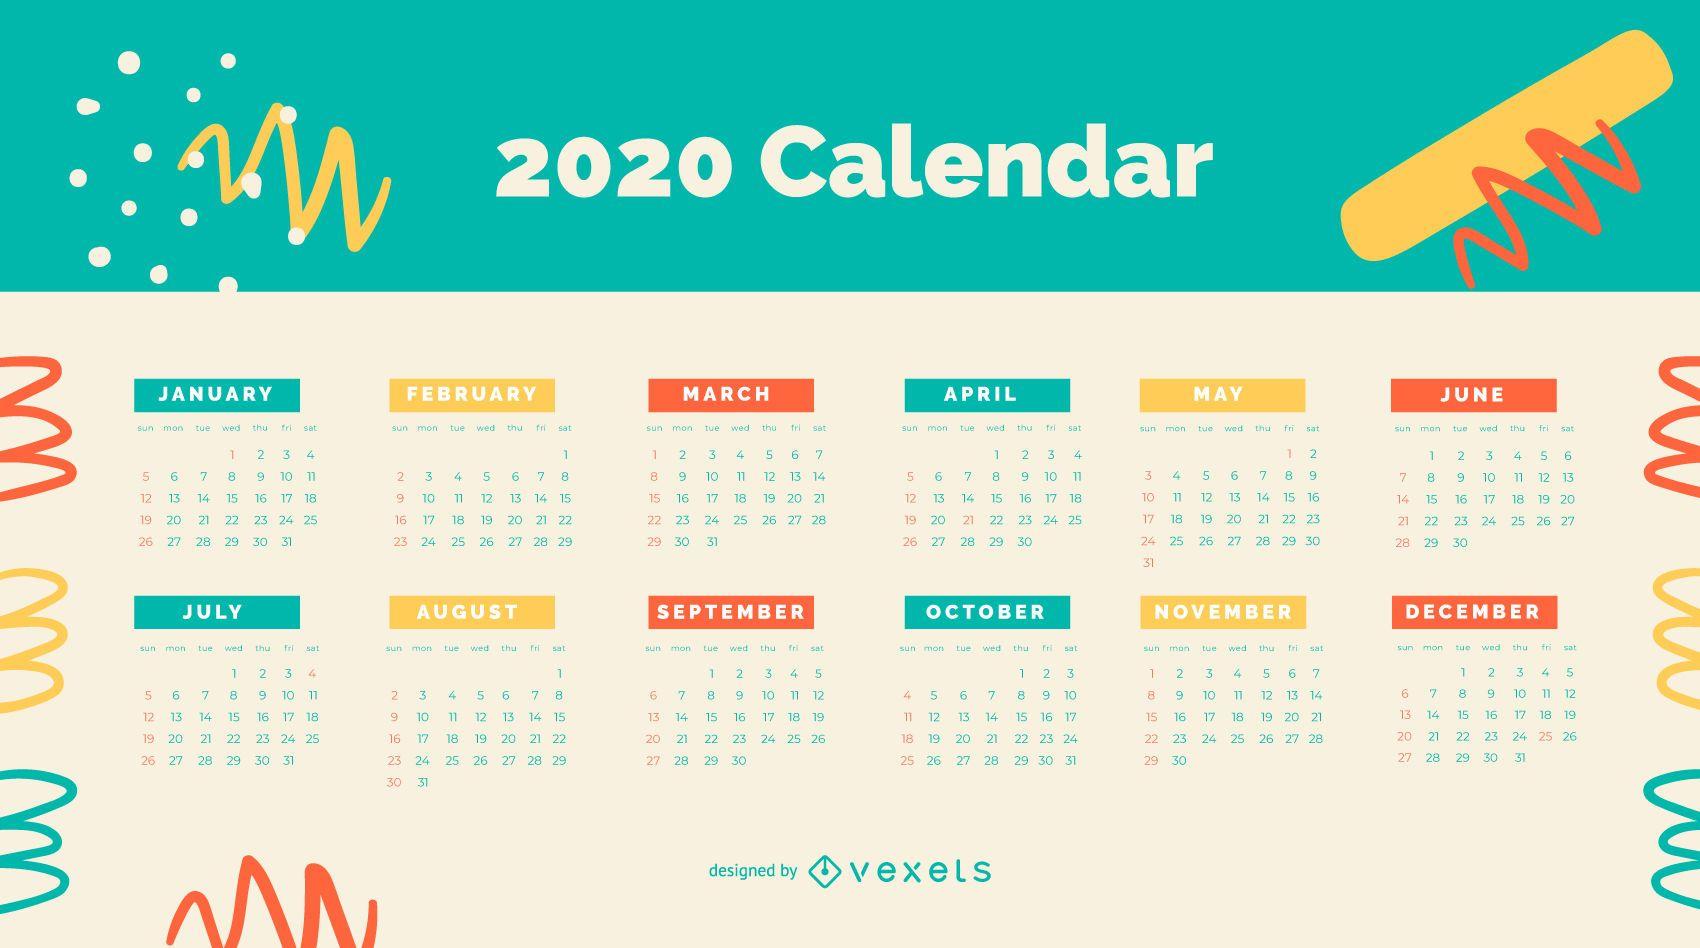 Colorful Abstract 2020 Calendar Design